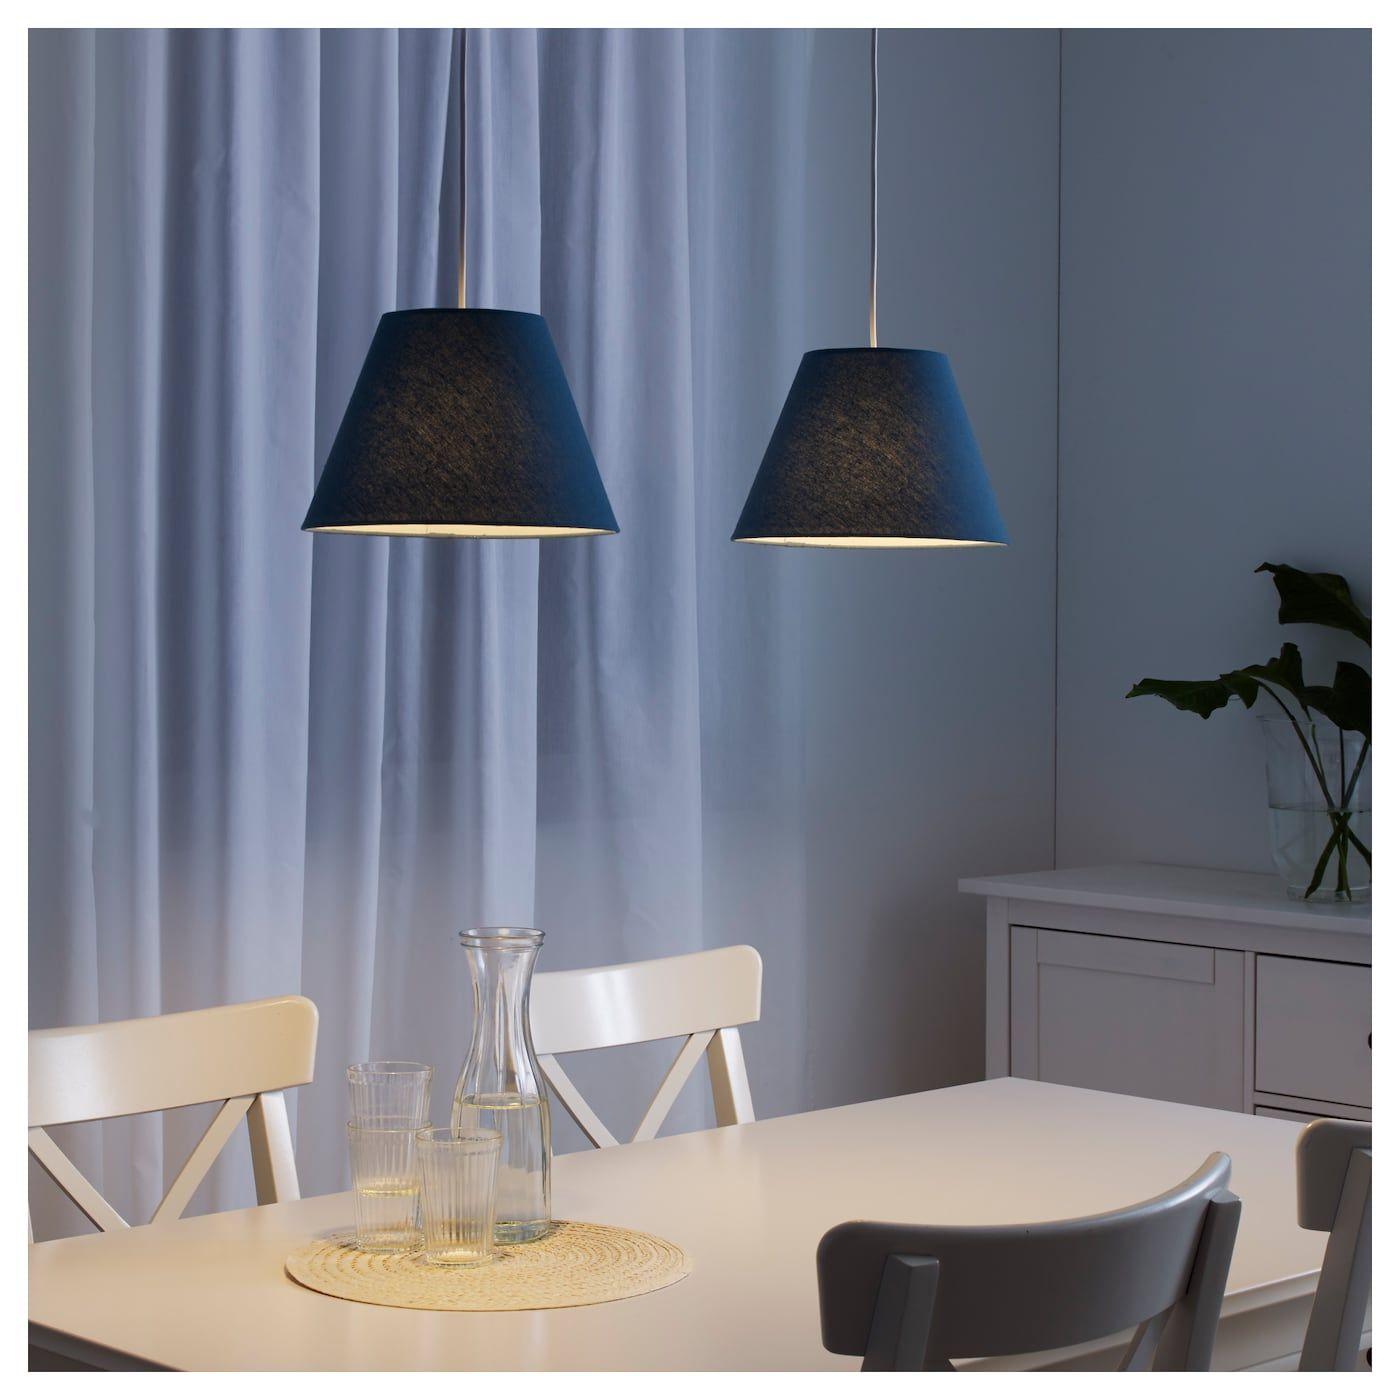 Products Lamp shade, Lamp, Ikea